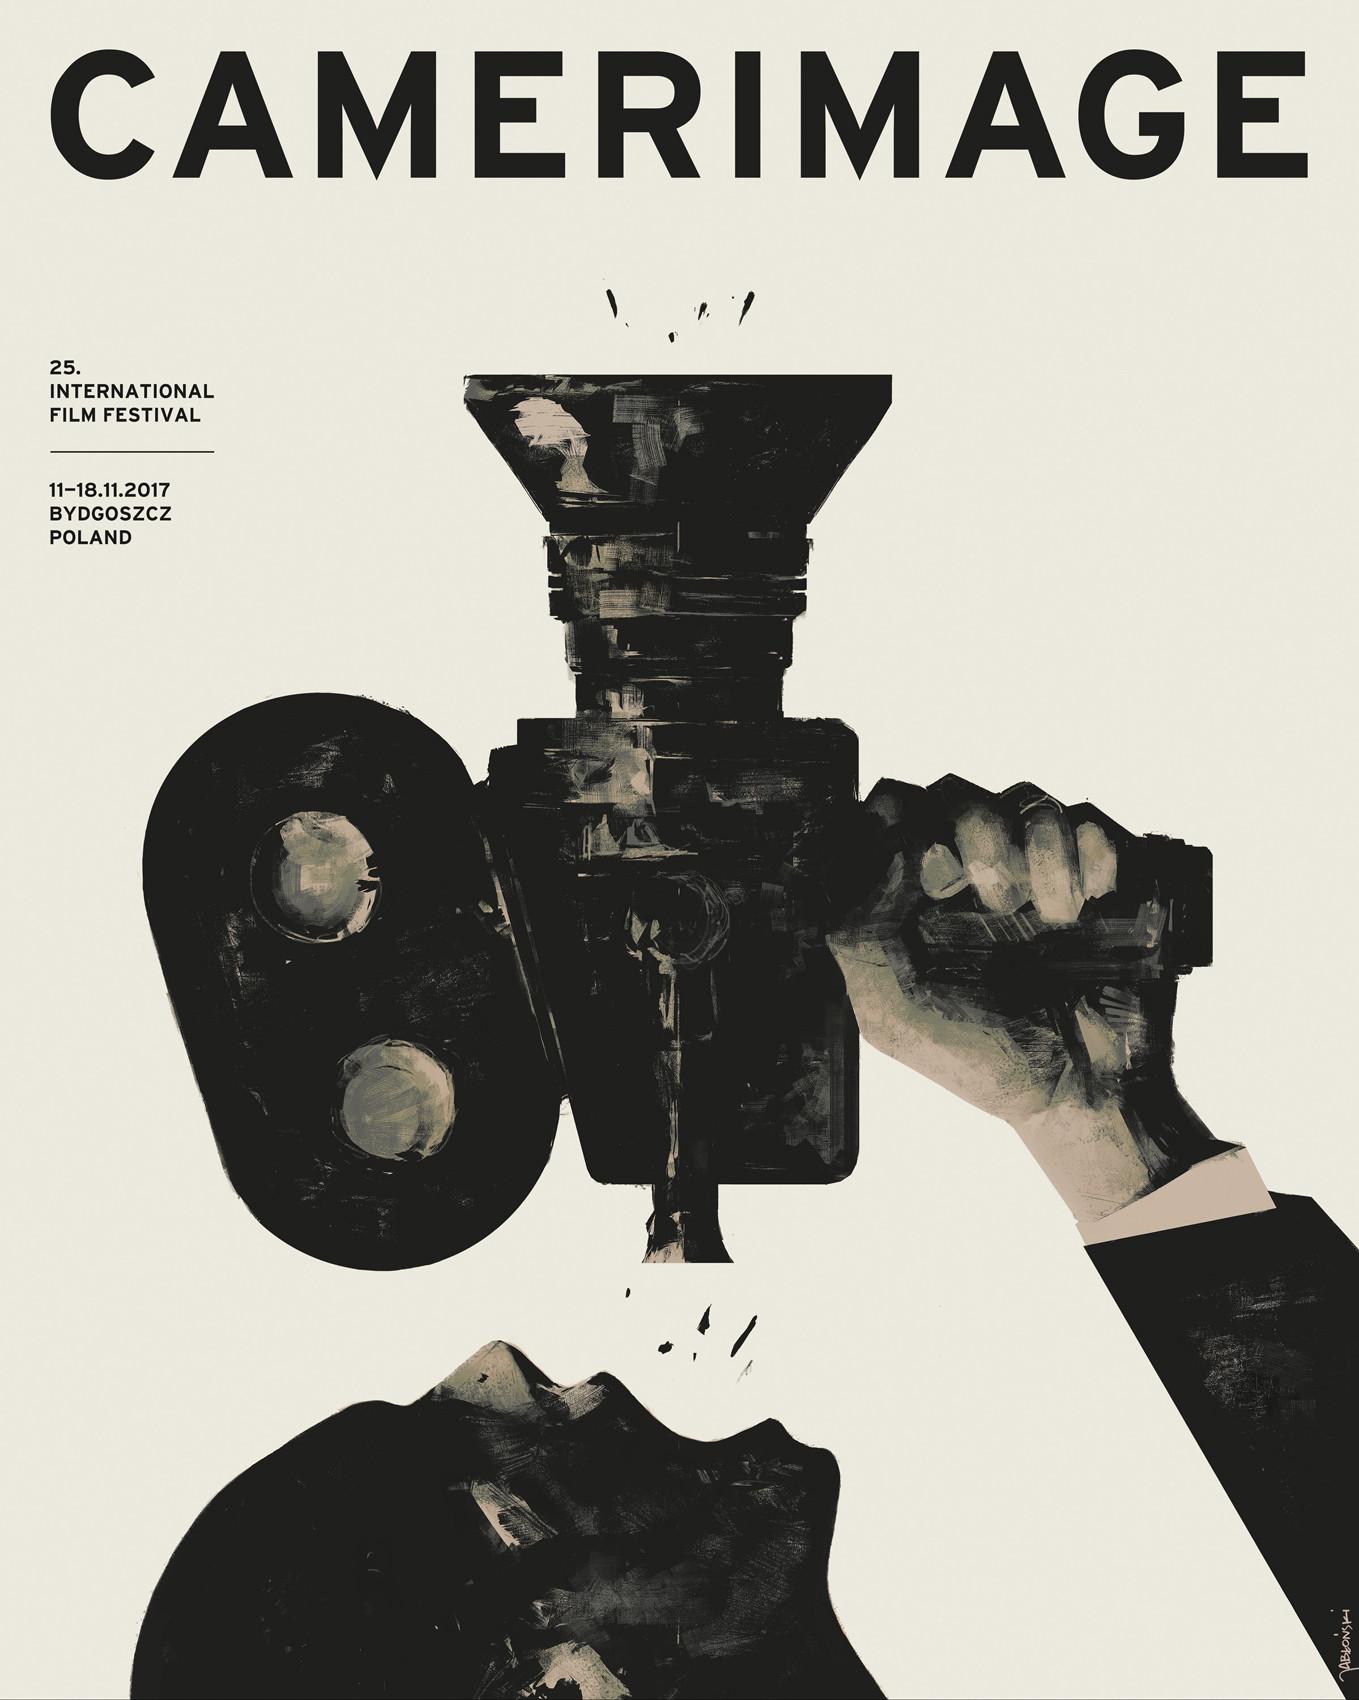 Piotr jablonski camerimage poster sss